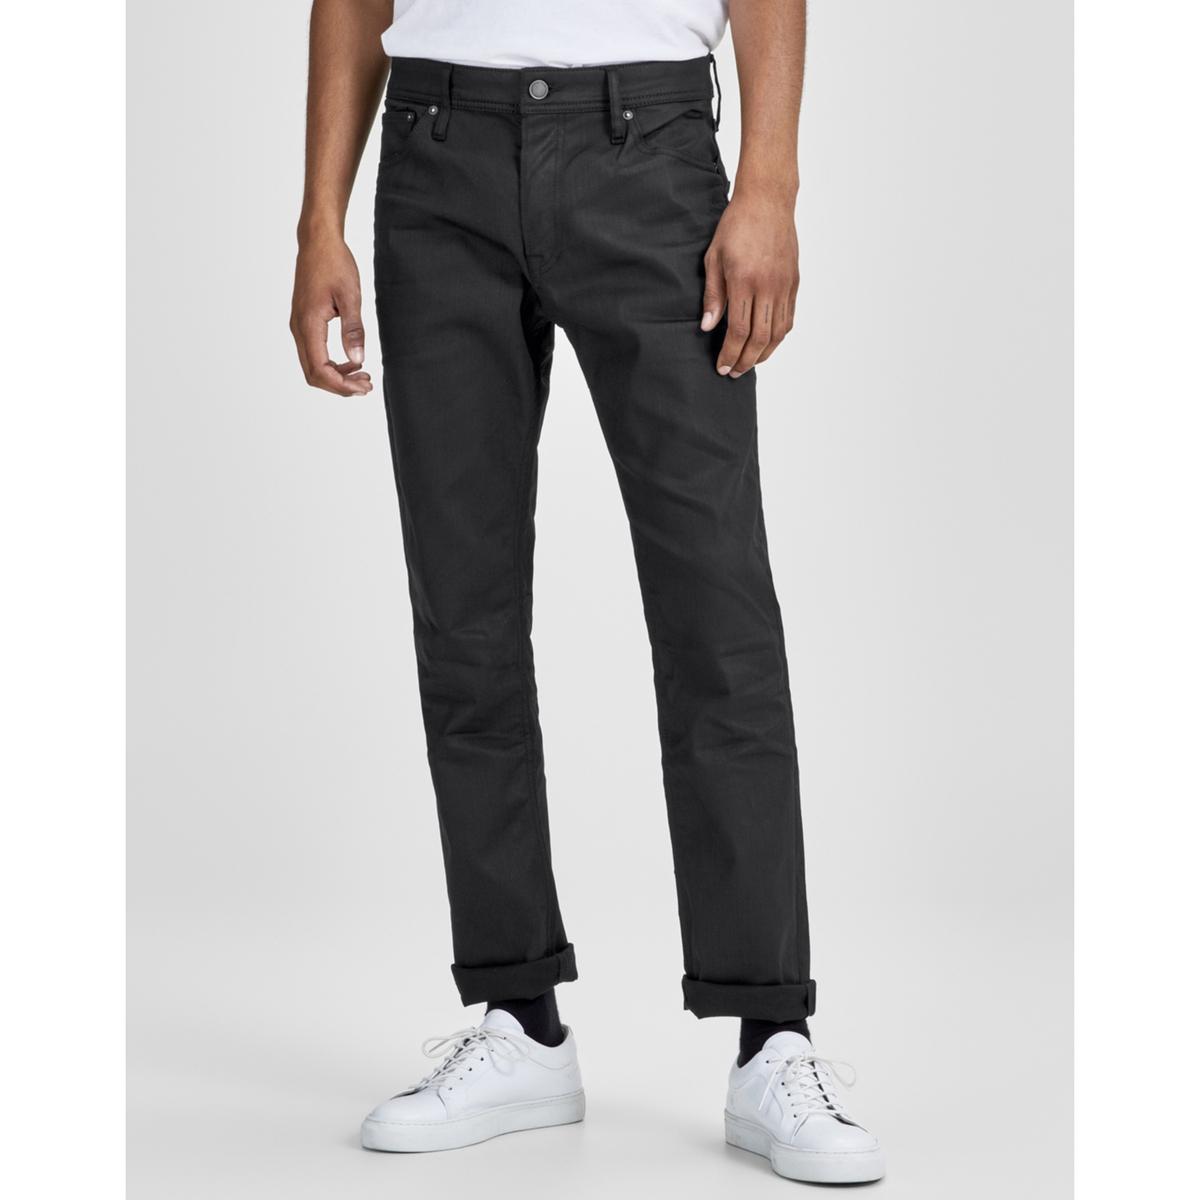 Jeans stretch, 5 bolsos, slim, JJITIM JJORIGINAL